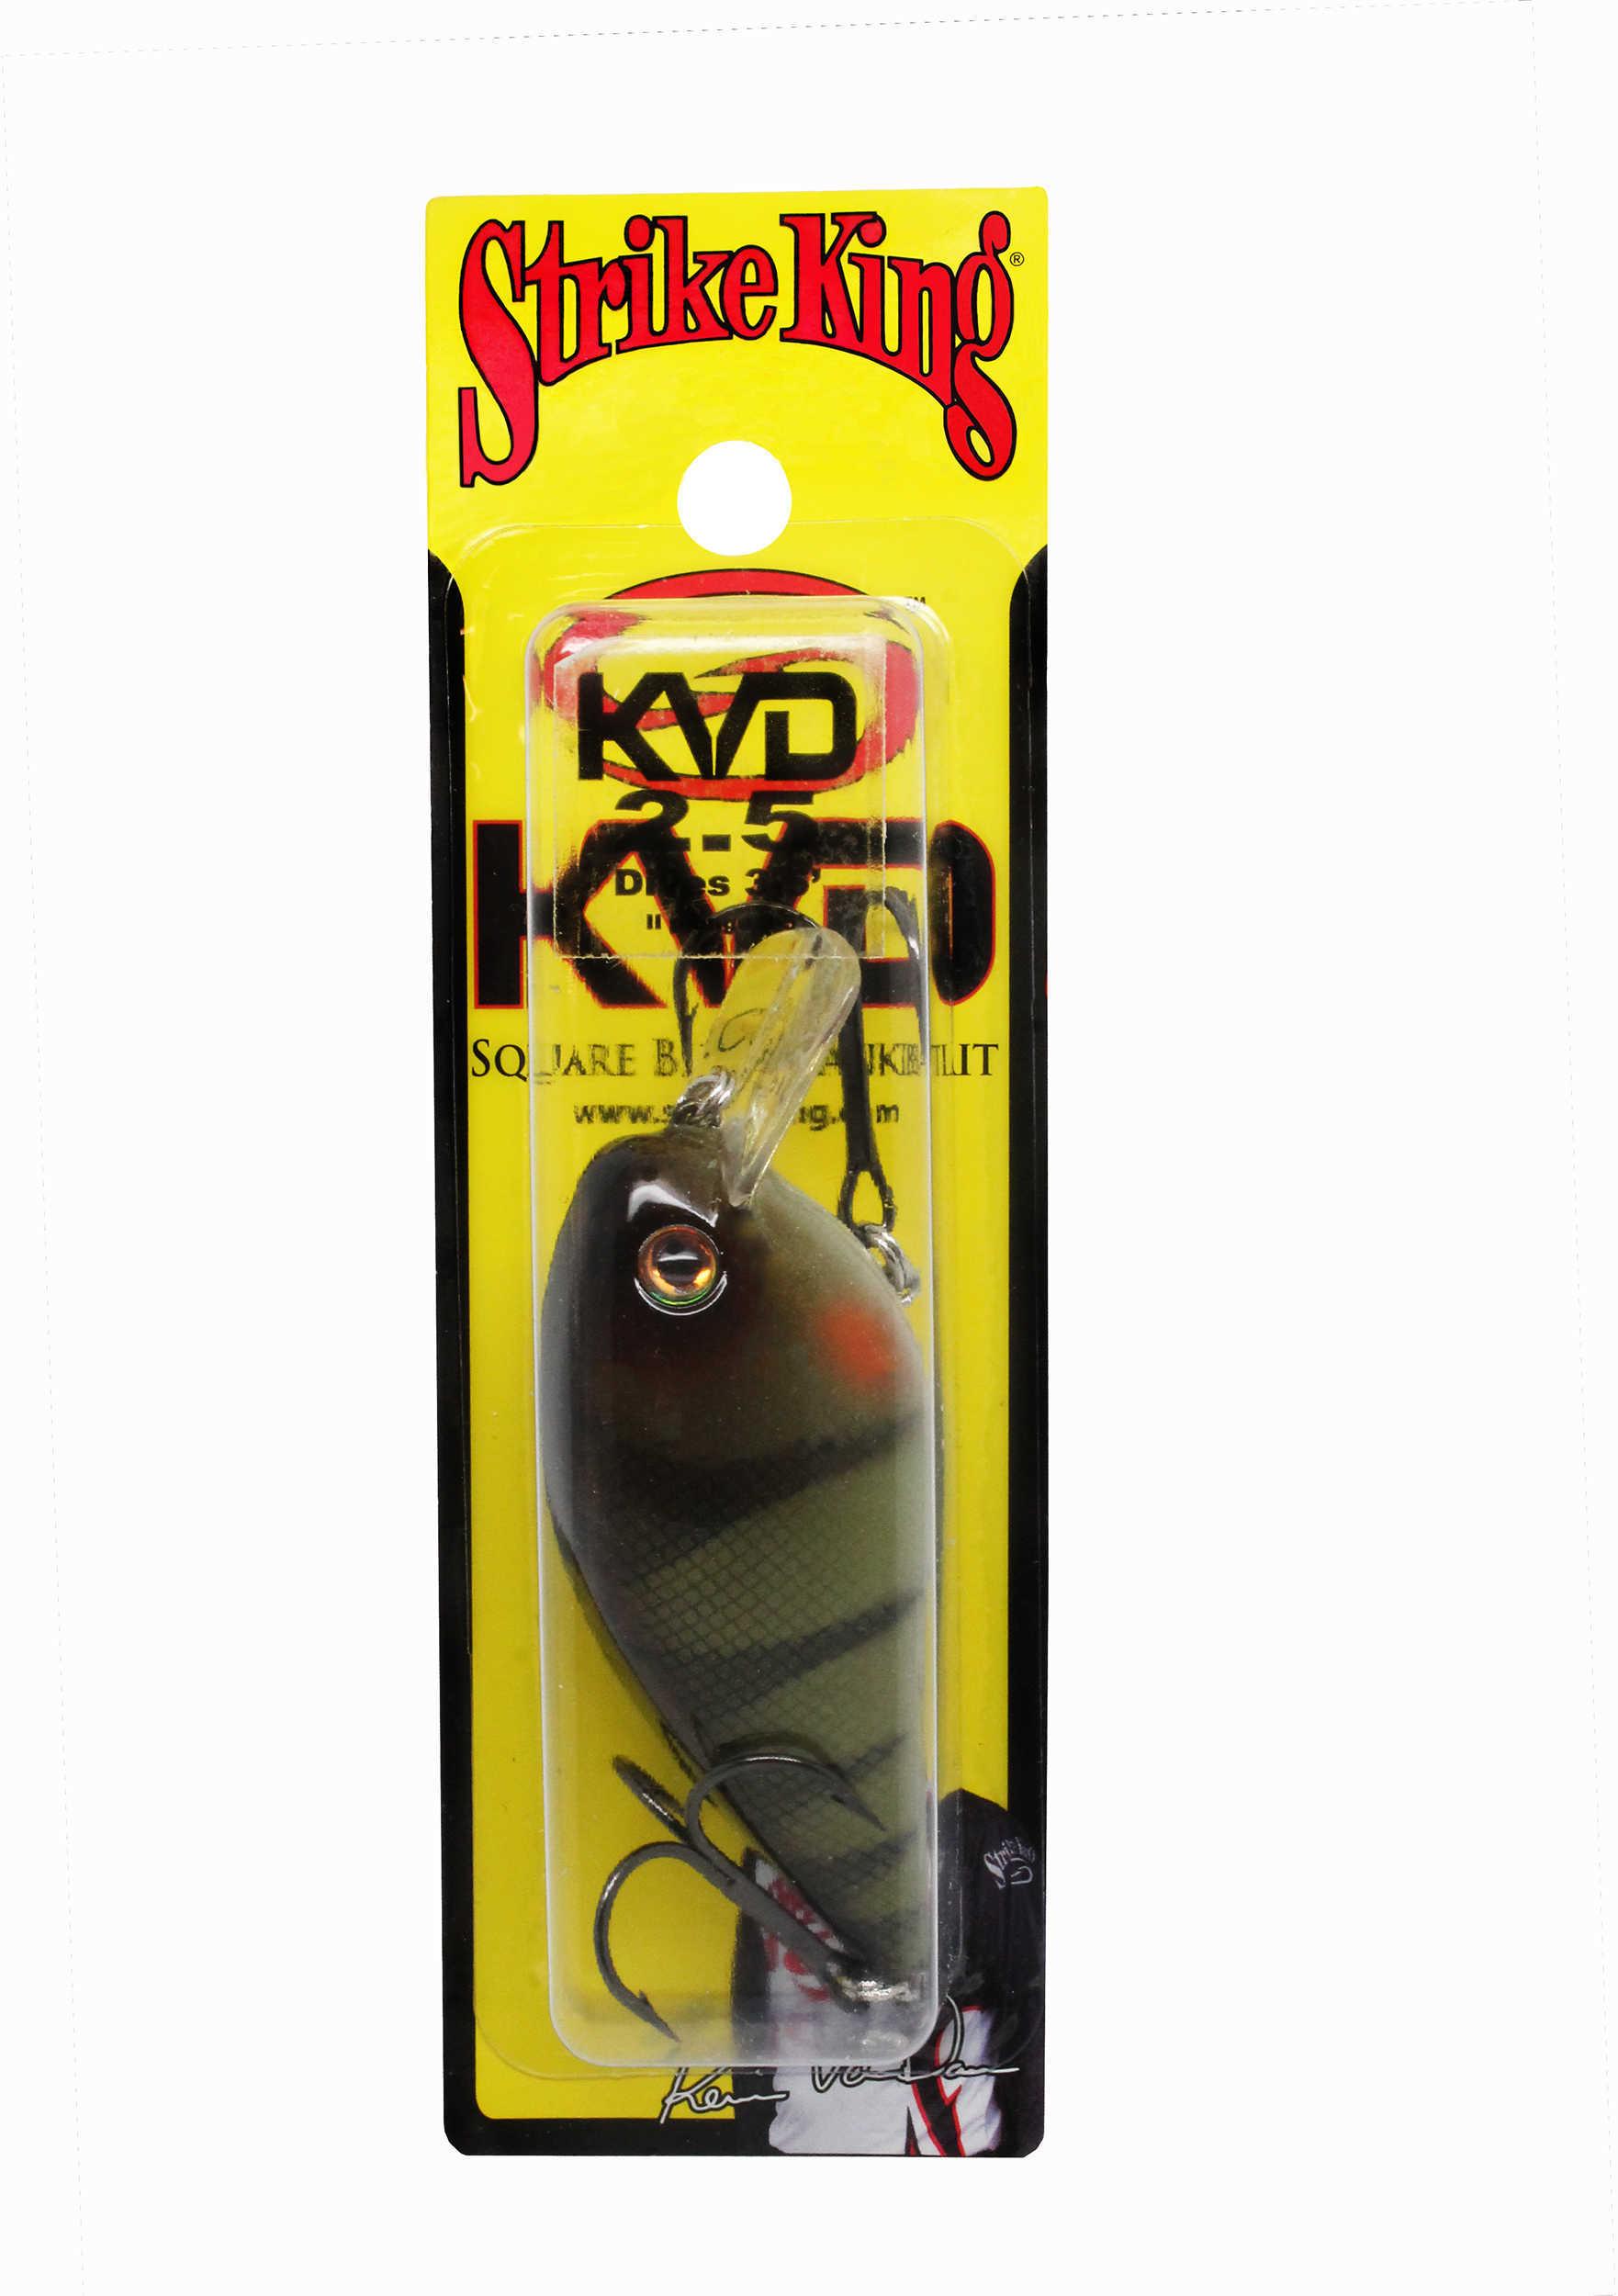 "Strike King Lures KVD Square Bill Hard Lure Model 2.5, 2 3/4"" Body Length, 3'-6' Depth, Yellow Perch, Per 1 Md: HCKVDS2."